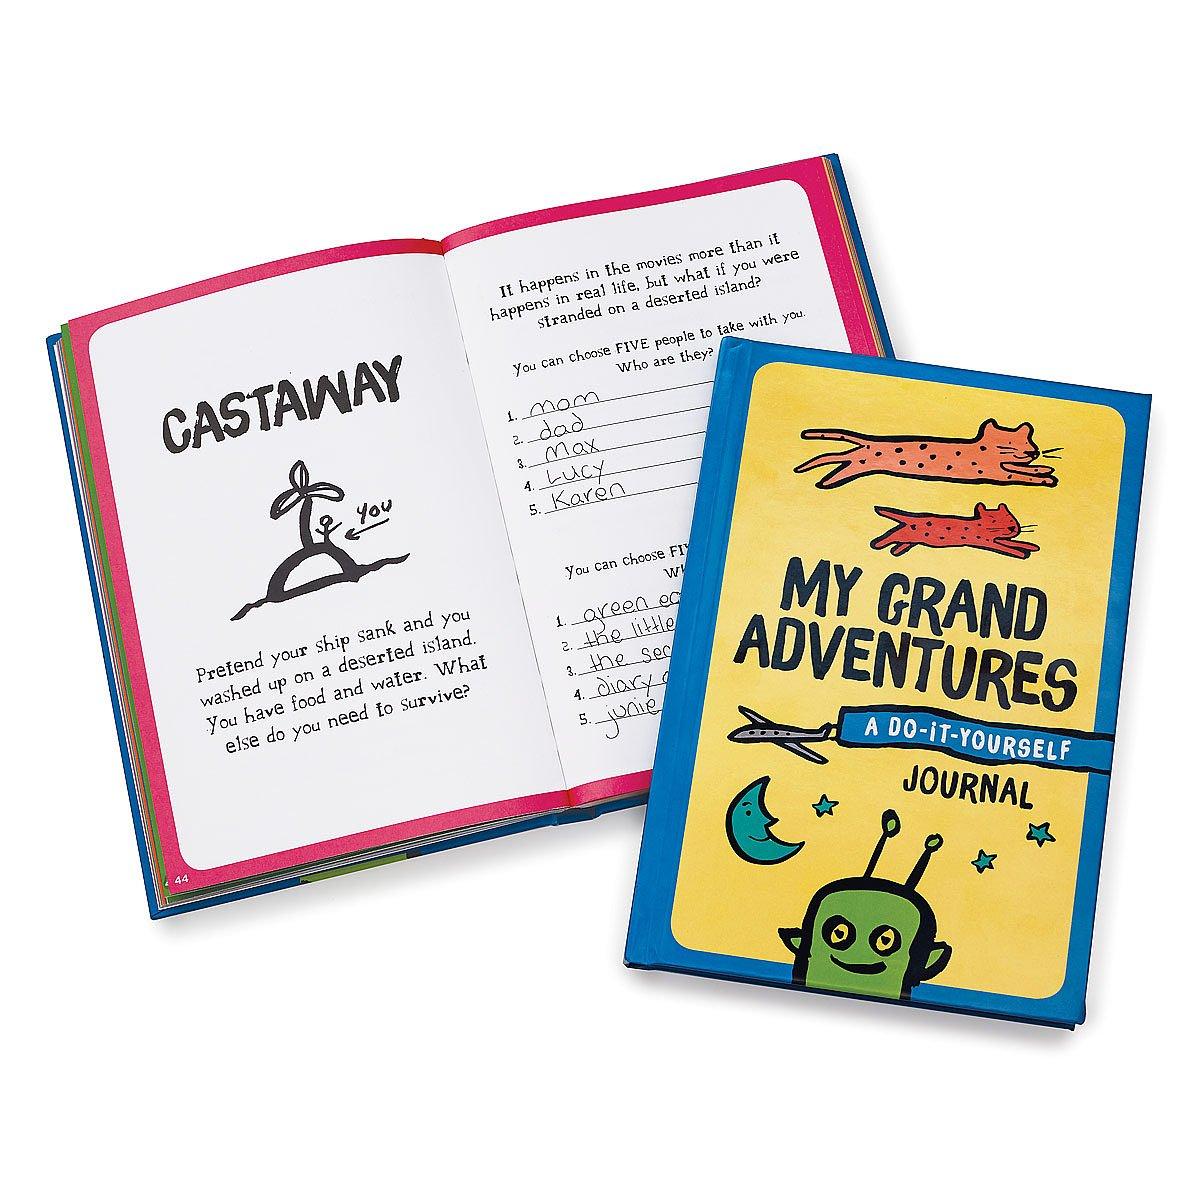 My grand adventures a diy journal kids journal uncommongoods my grand adventures a diy journal 1 thumbnail solutioingenieria Gallery